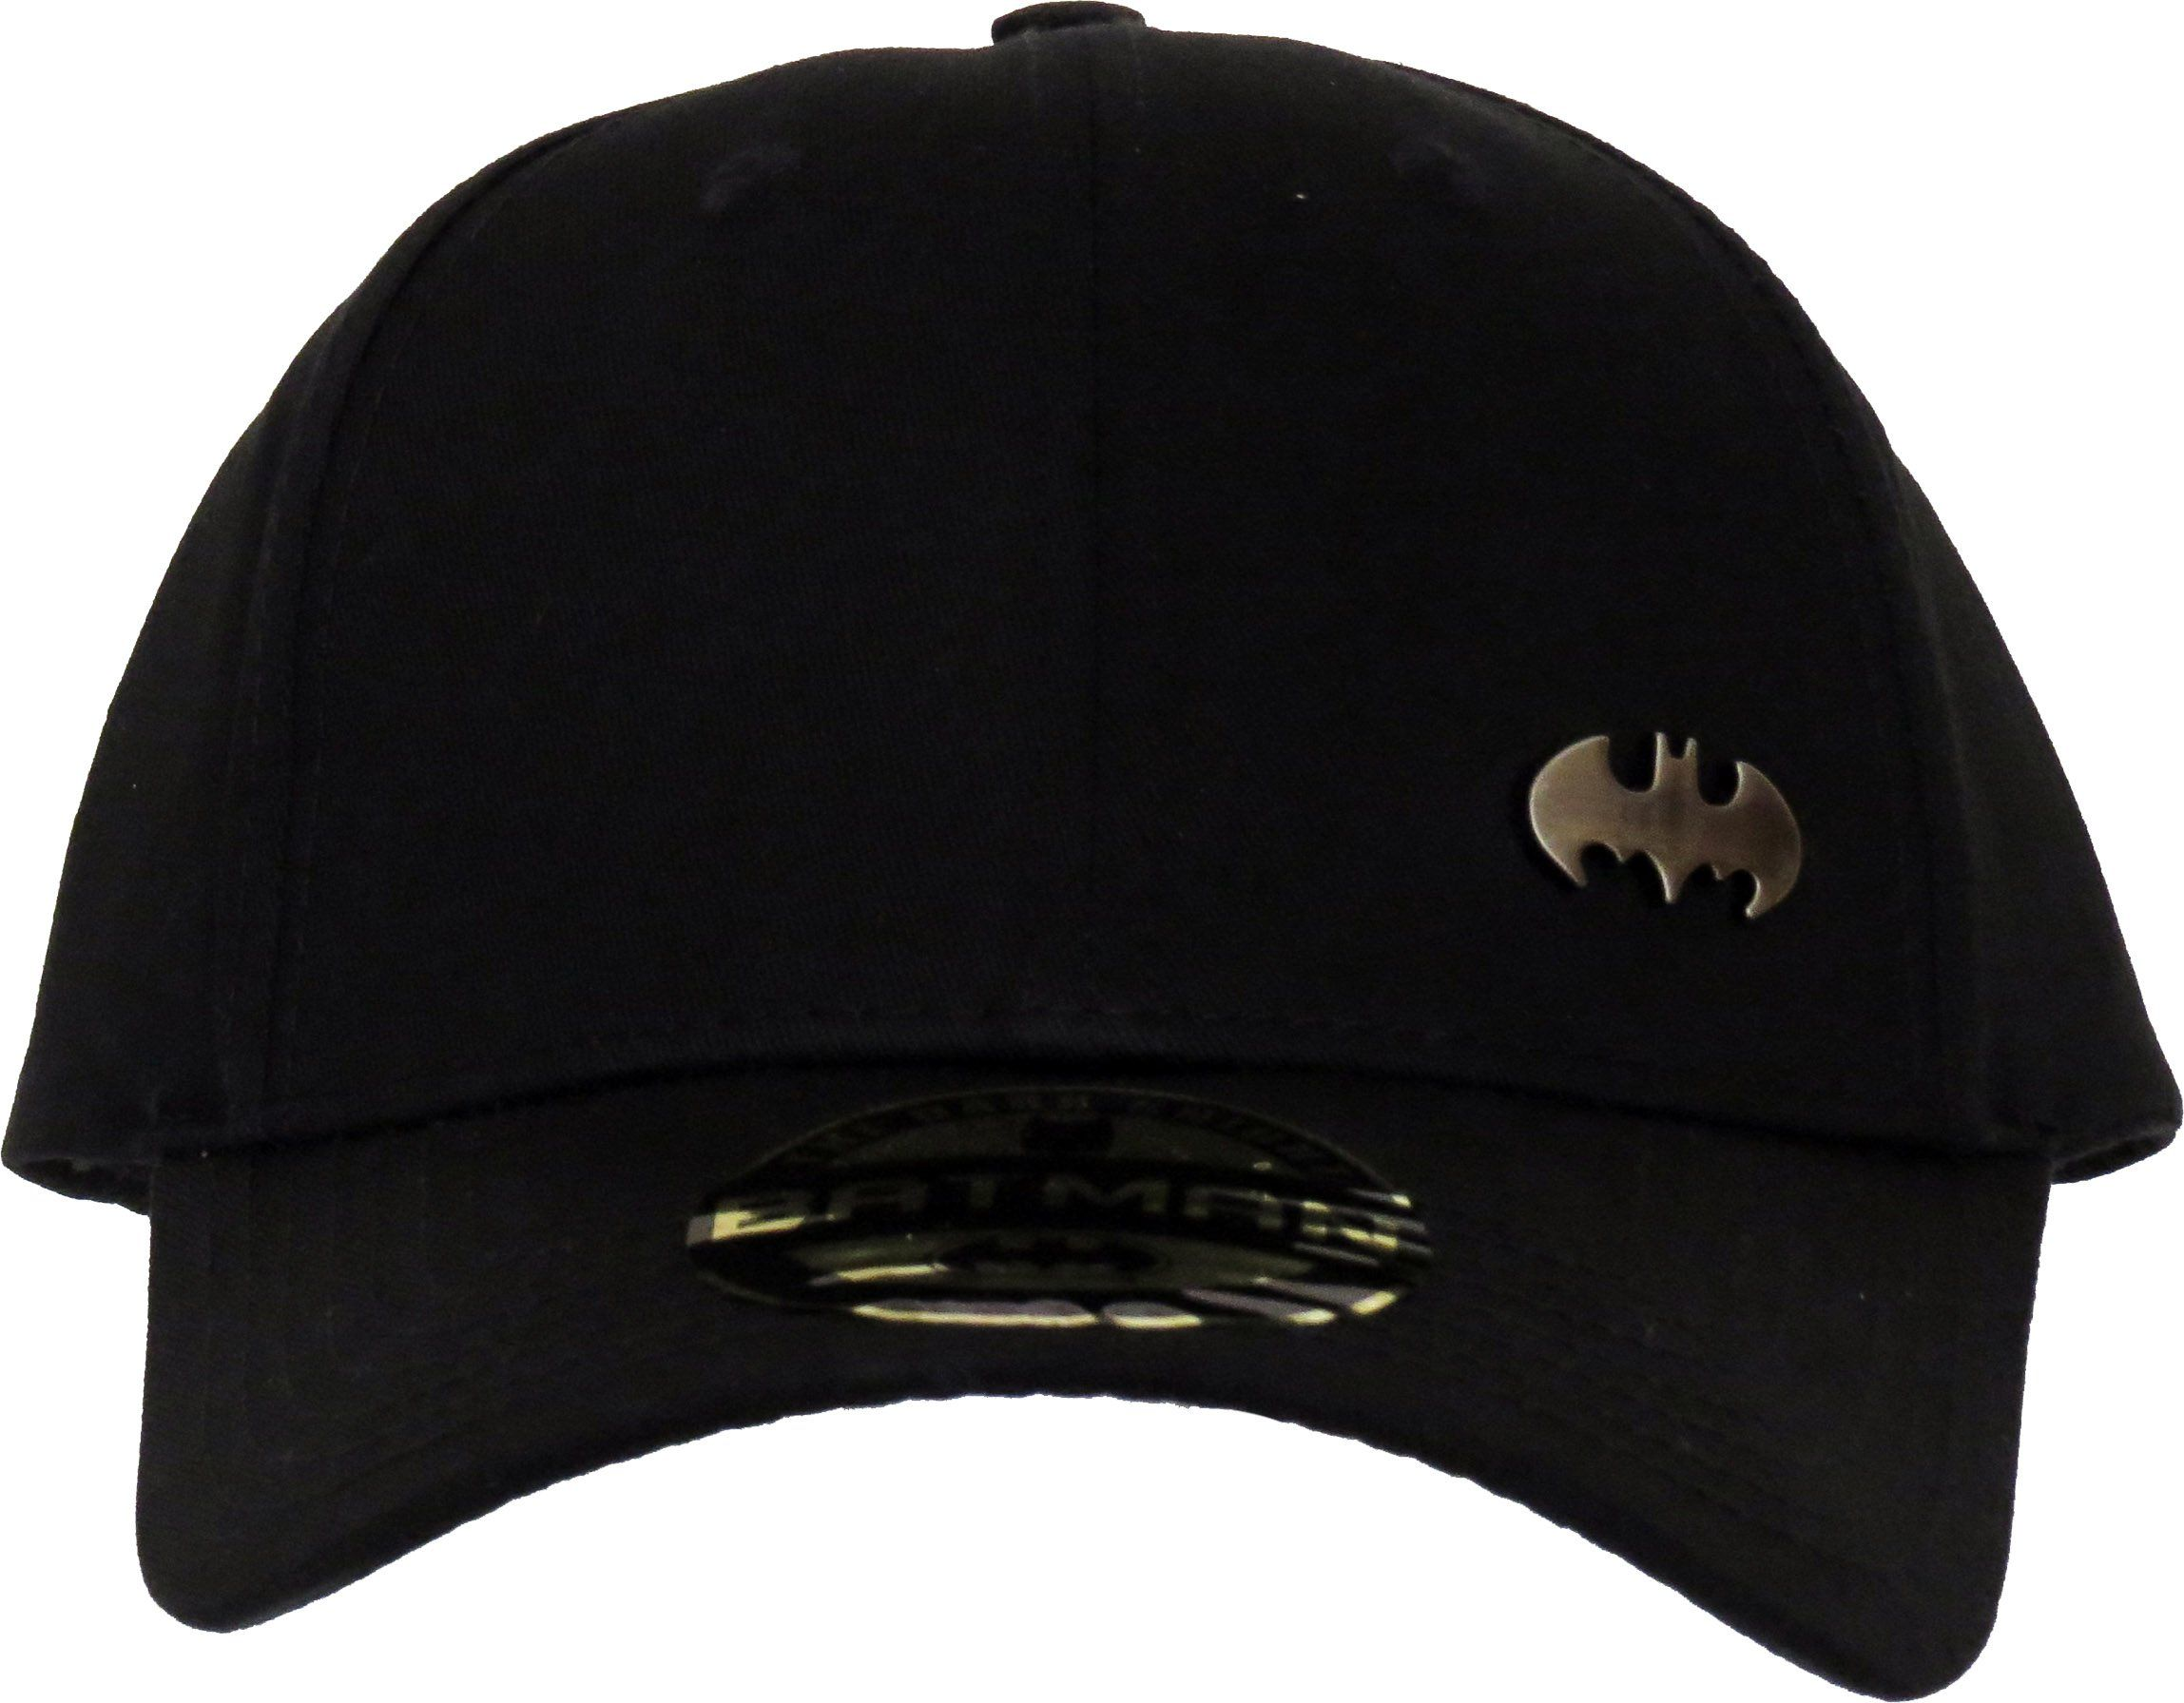 Age 2-10 years DC Comics Batman New Era Kids Camo Trucker Cap